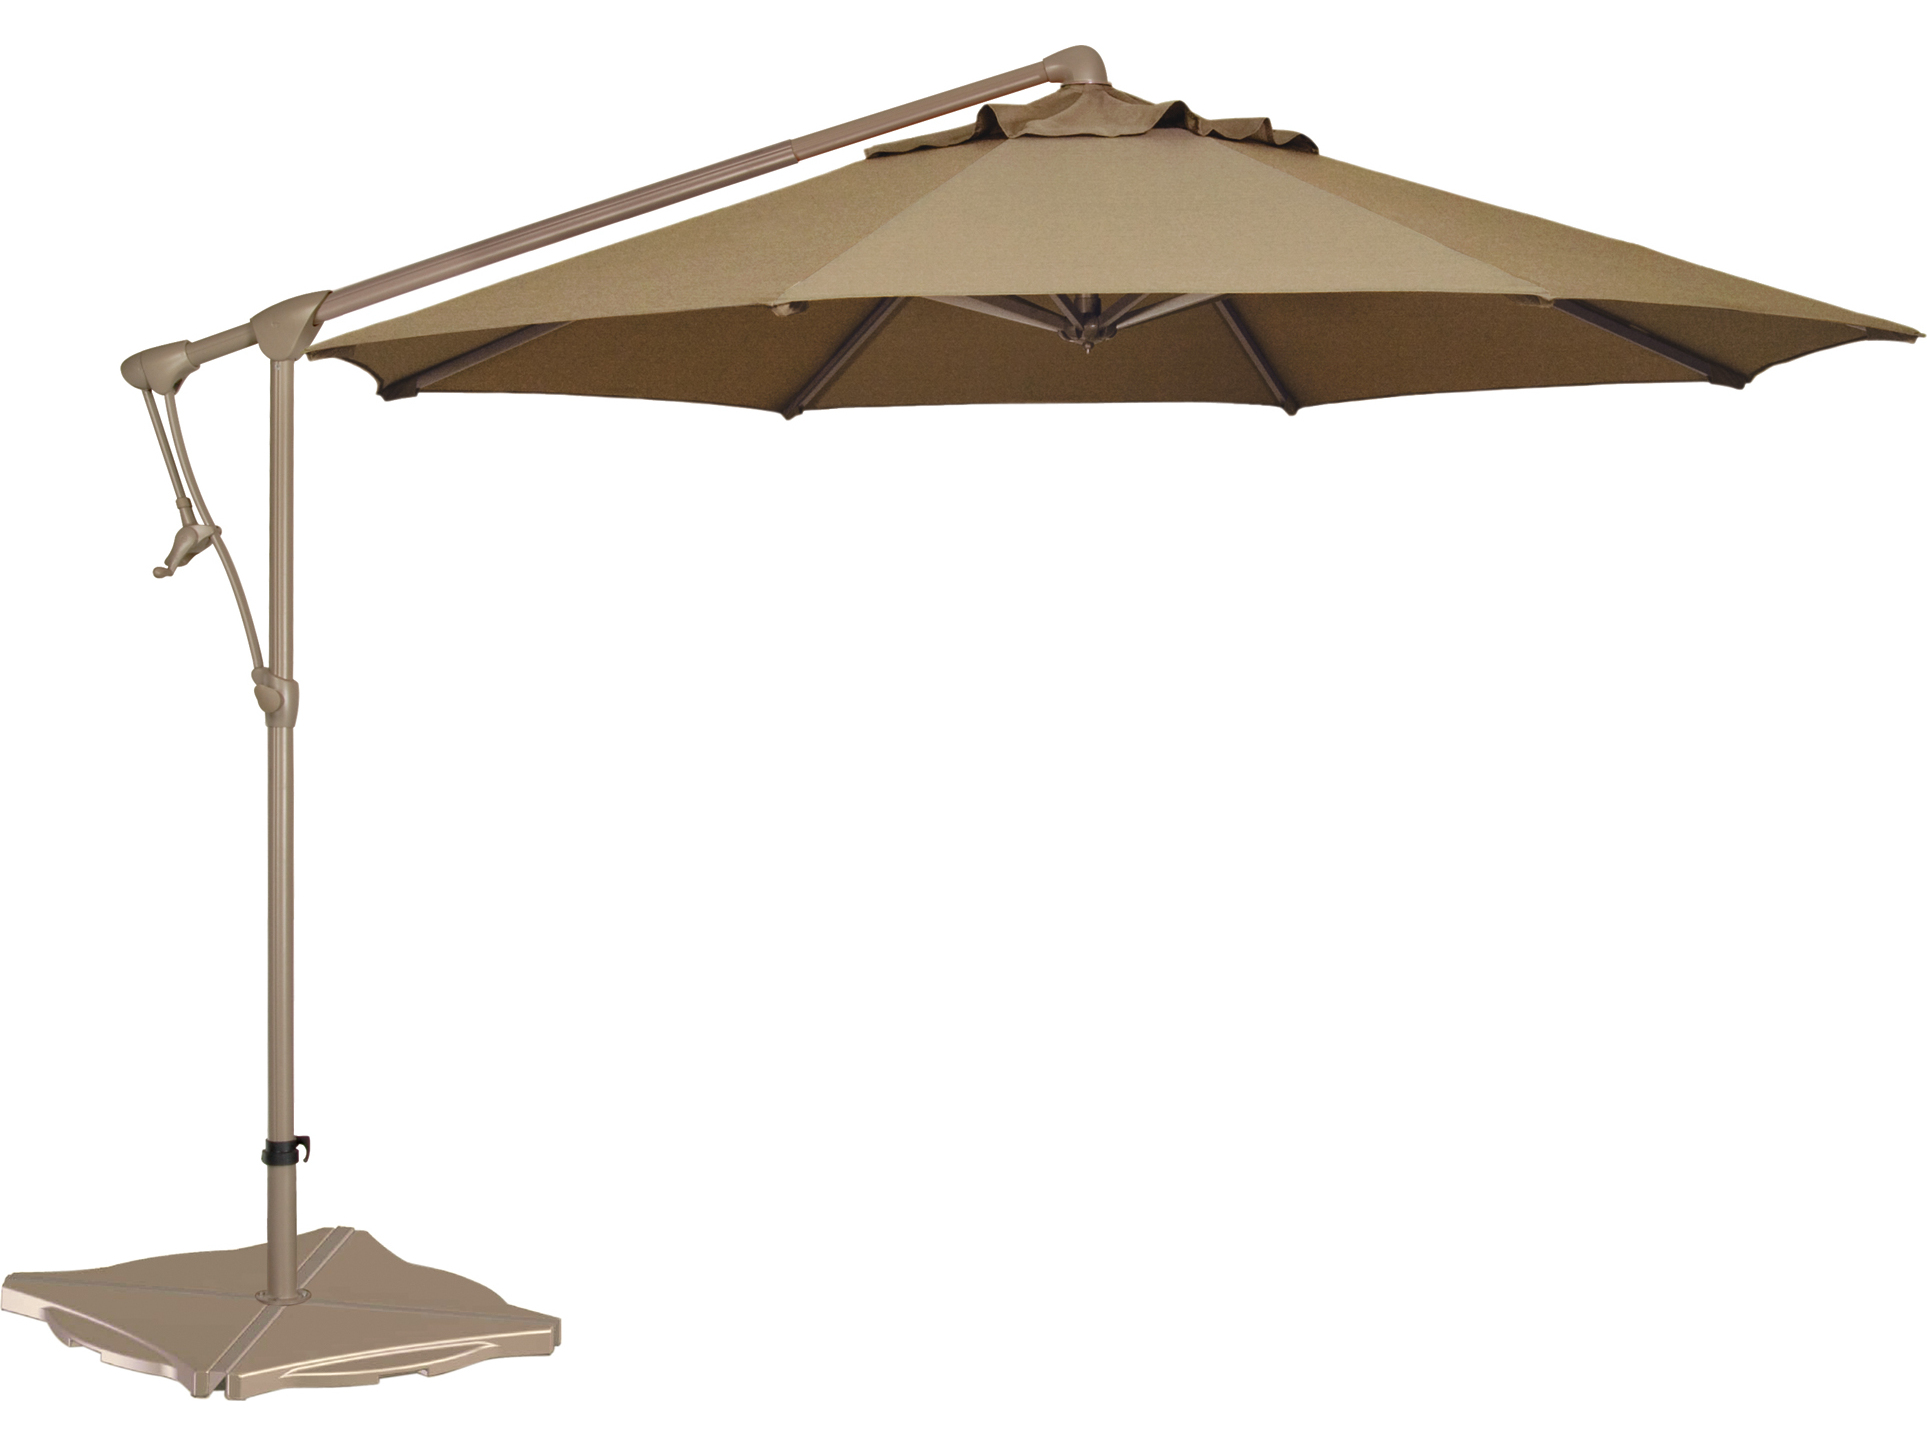 treasure garden cantilever aluminum 10 39 octagon tilt lock offset umbrella ag19